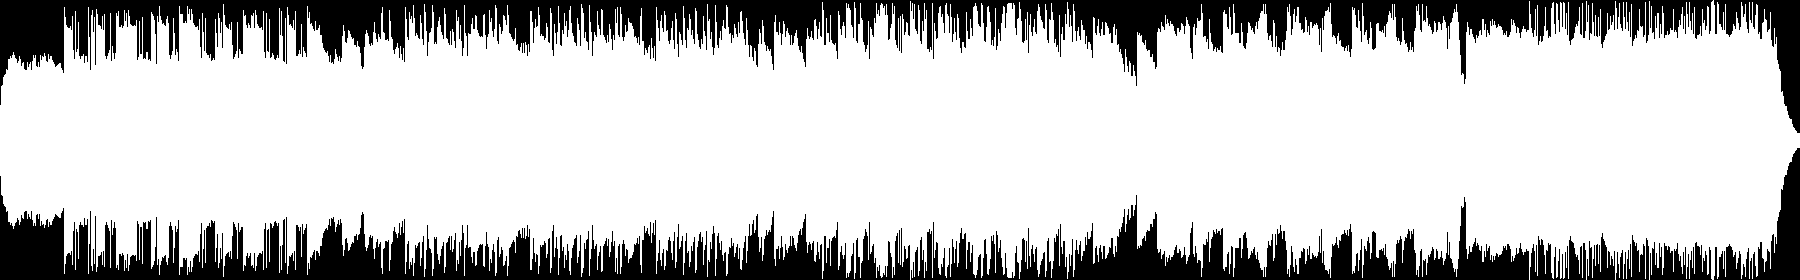 Lo-Fi Drill audio waveform